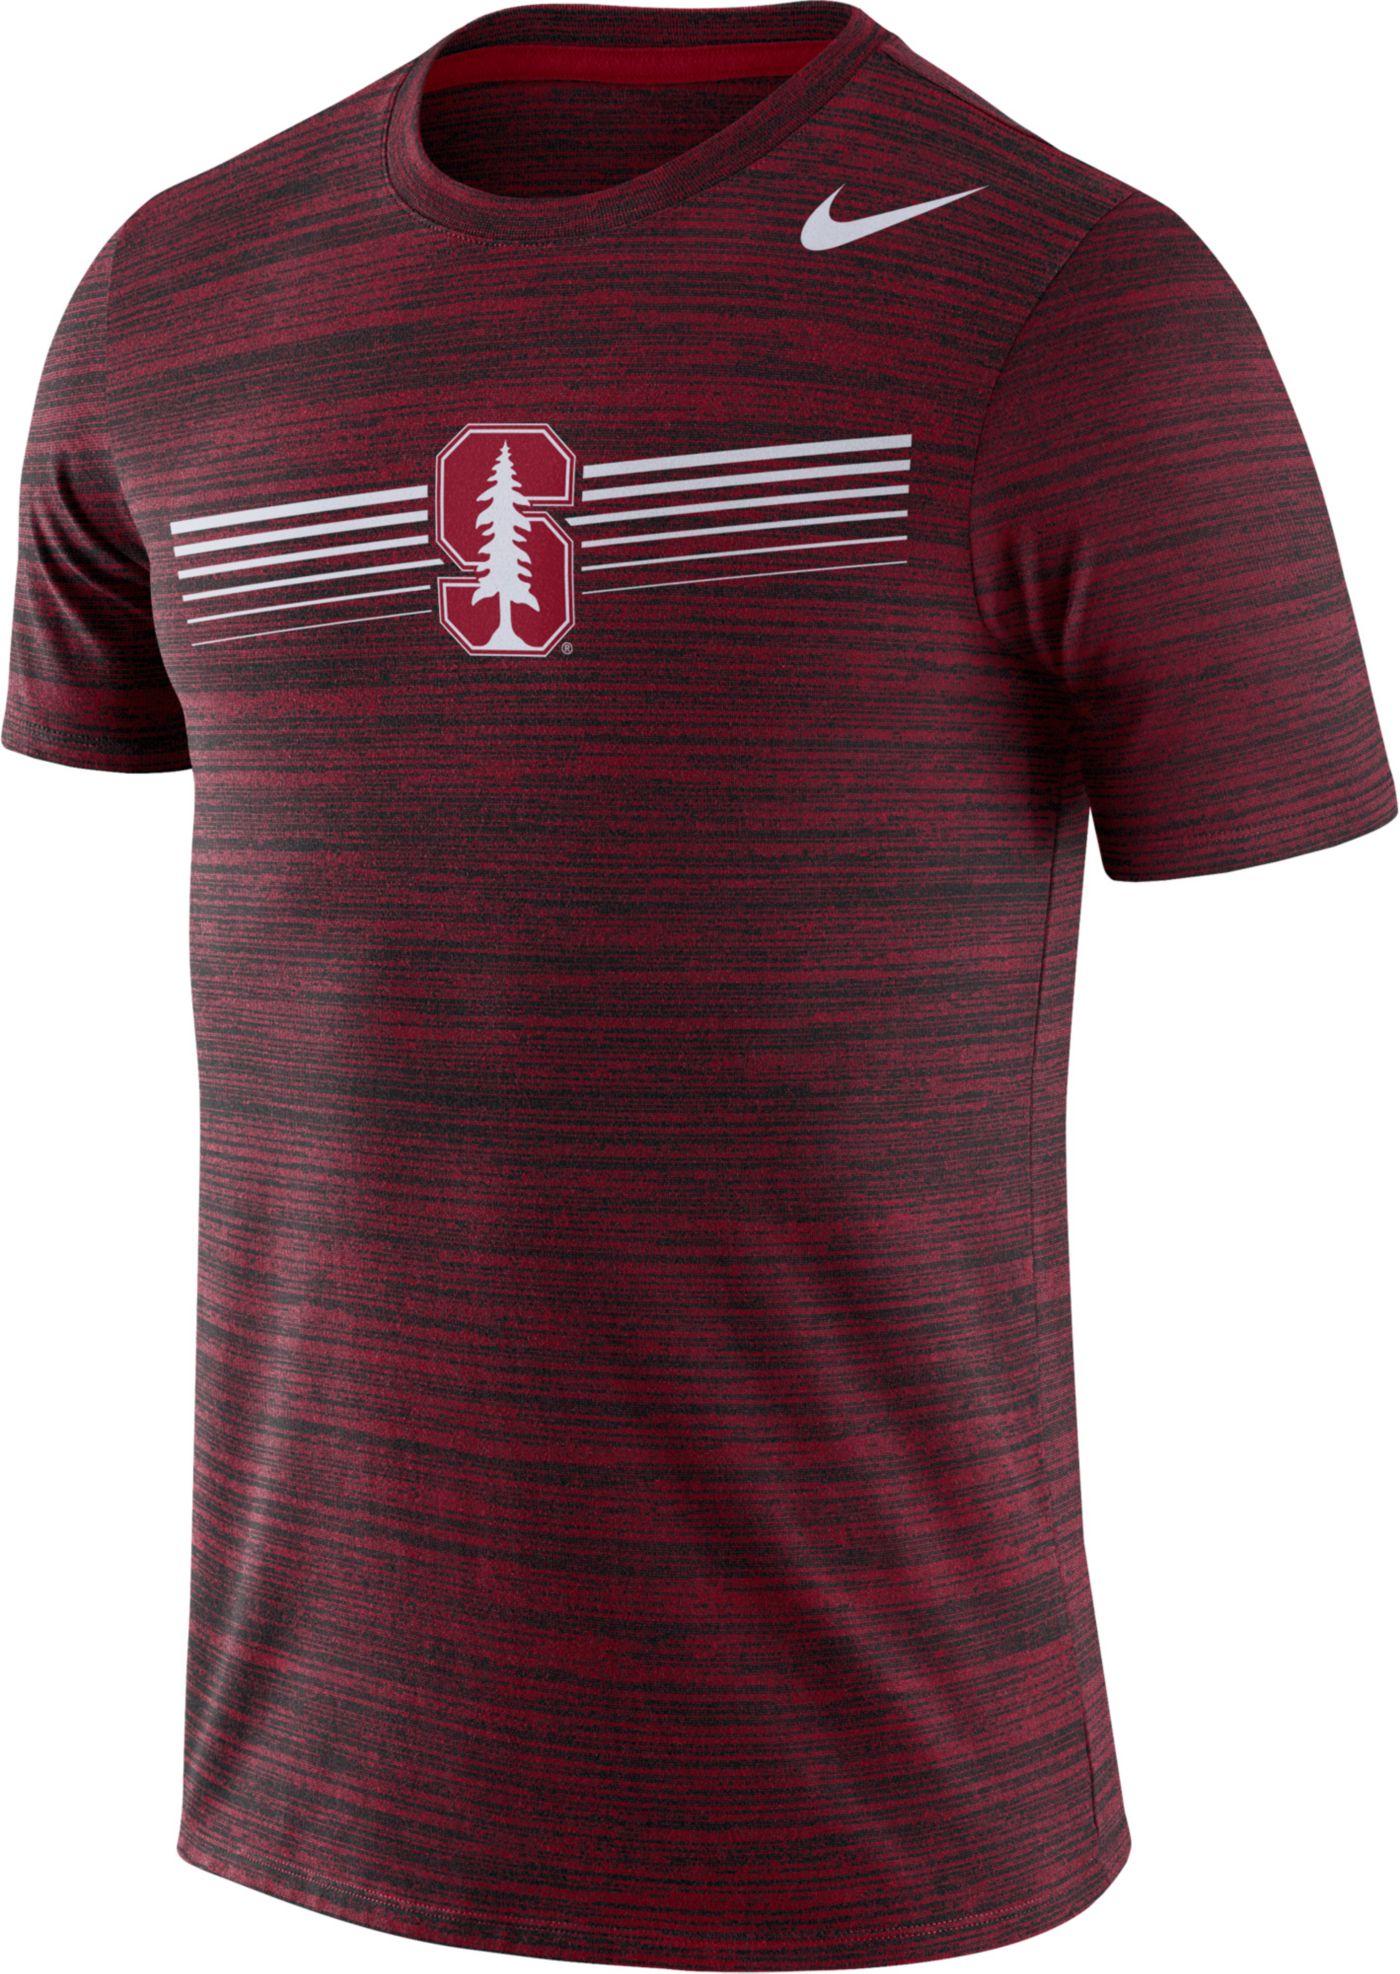 Nike Men's Stanford Cardinal Cardinal Velocity Legend Graphic T-Shirt